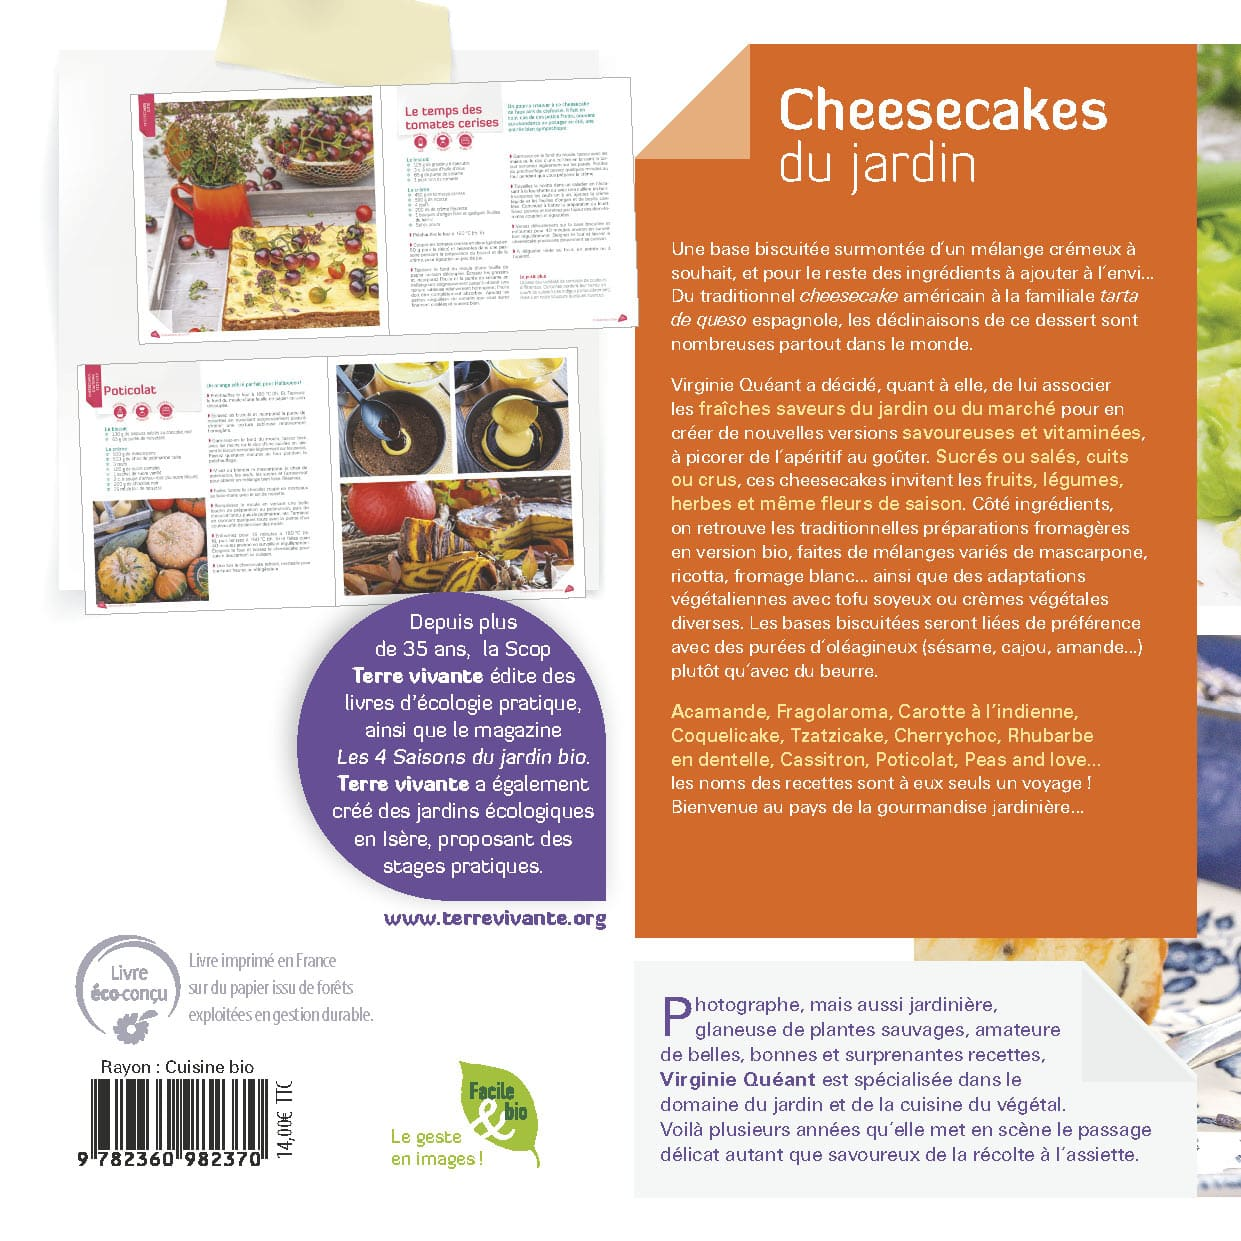 Cheesecakes du jardin 1